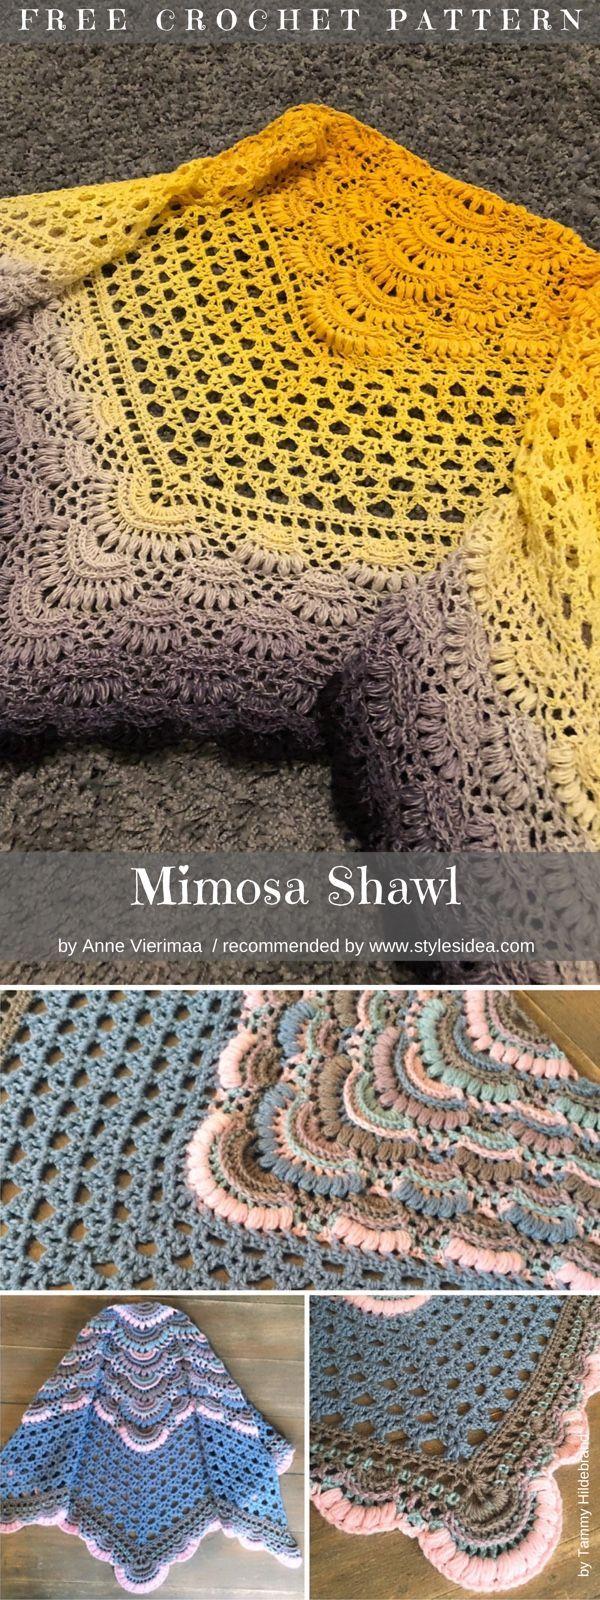 Stunning Evening Shawls Free Crochet Pattern | Pinterest | Free ...